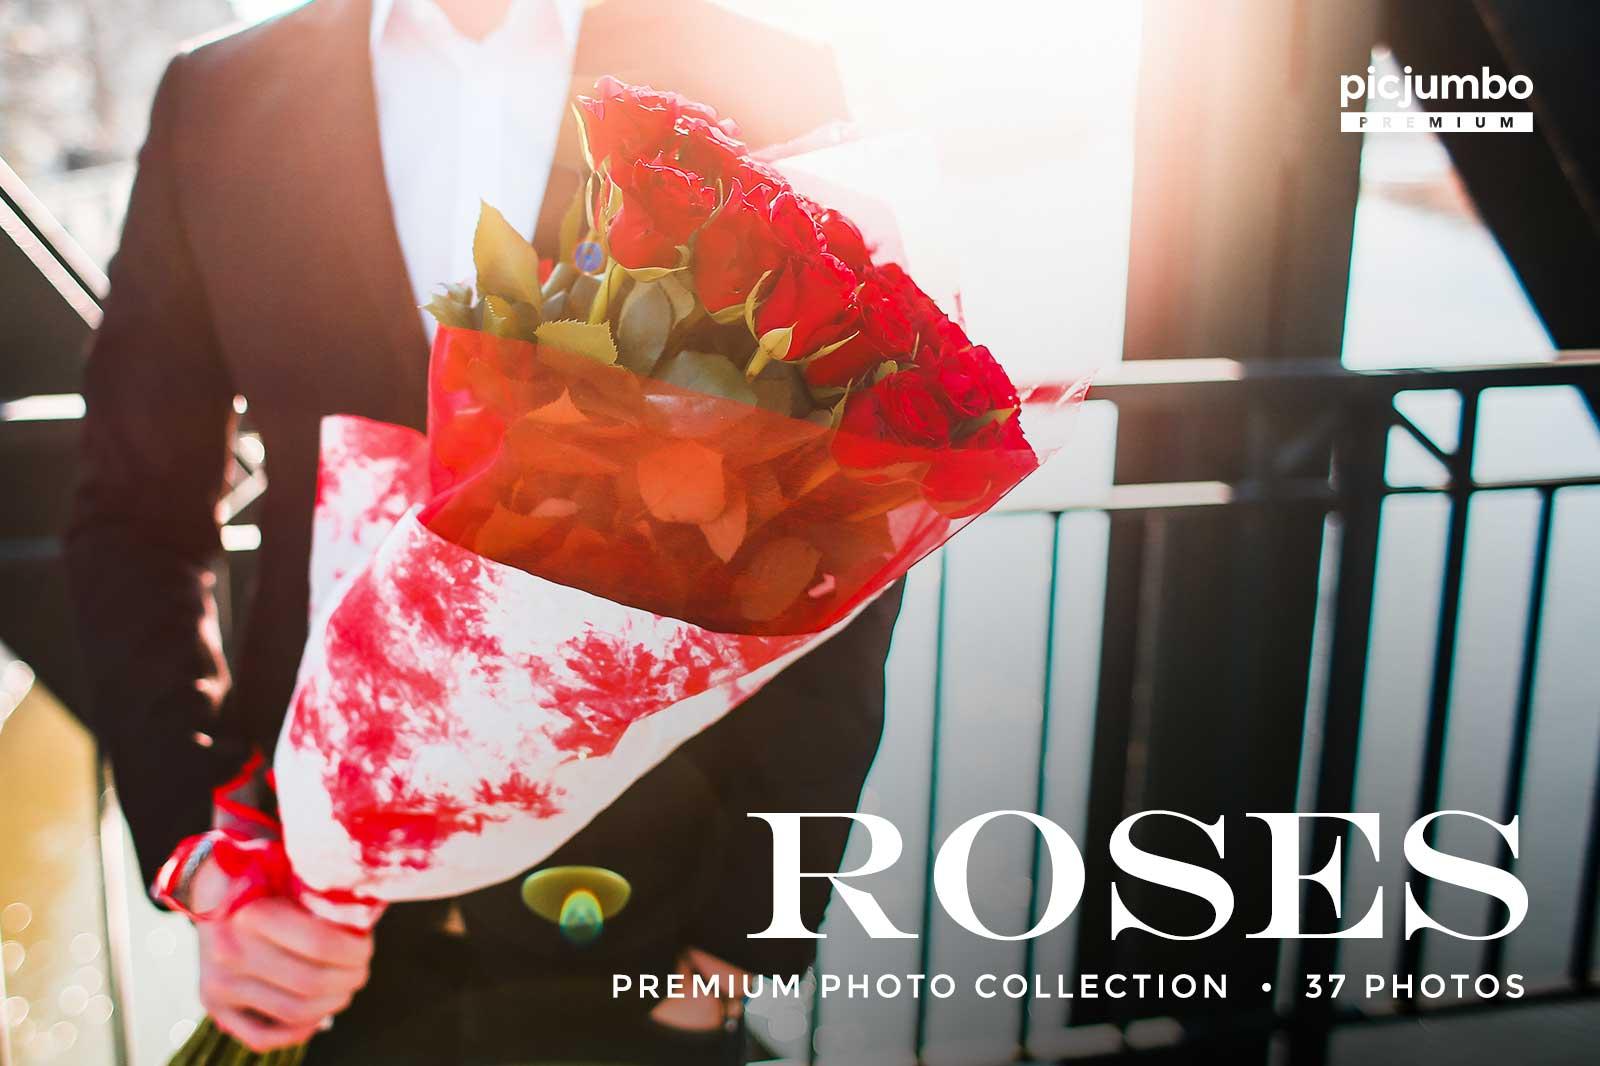 roses-stock-photo-download.jpg